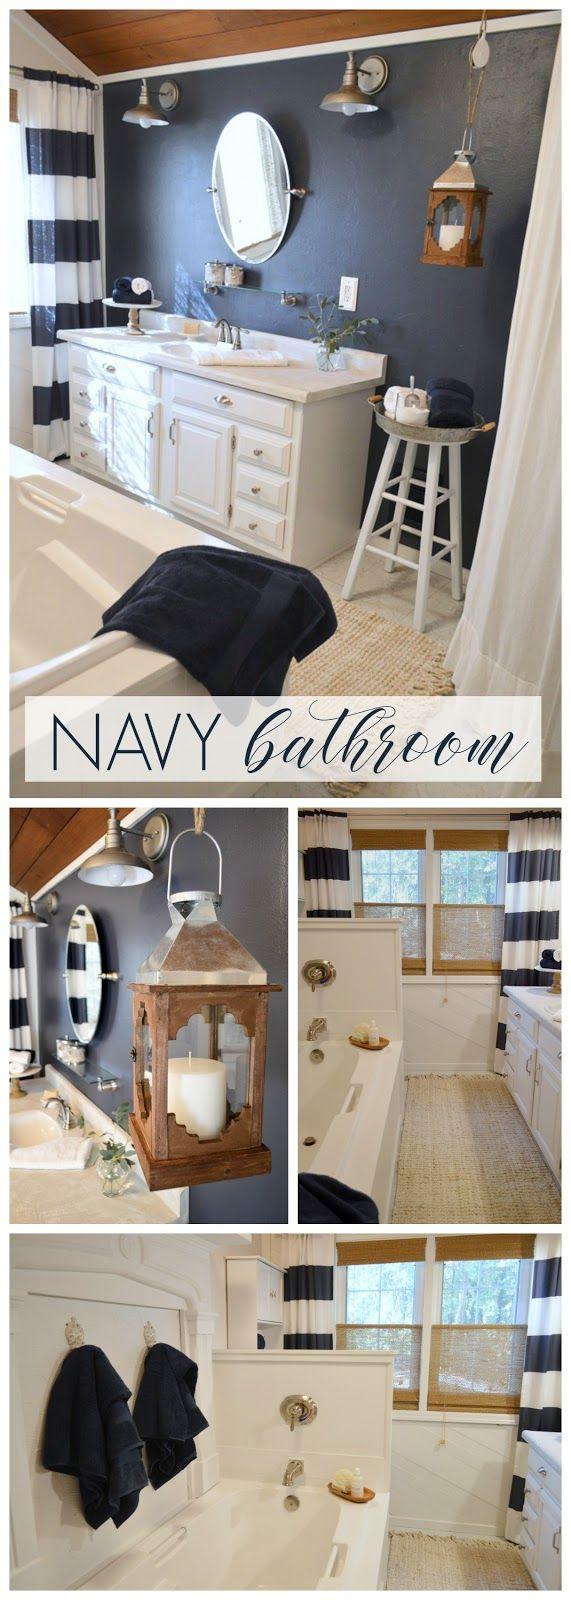 mesmerizing nautical bathroom makeover | Navy Blue Cottage Bathroom Makeover | Renovations ...